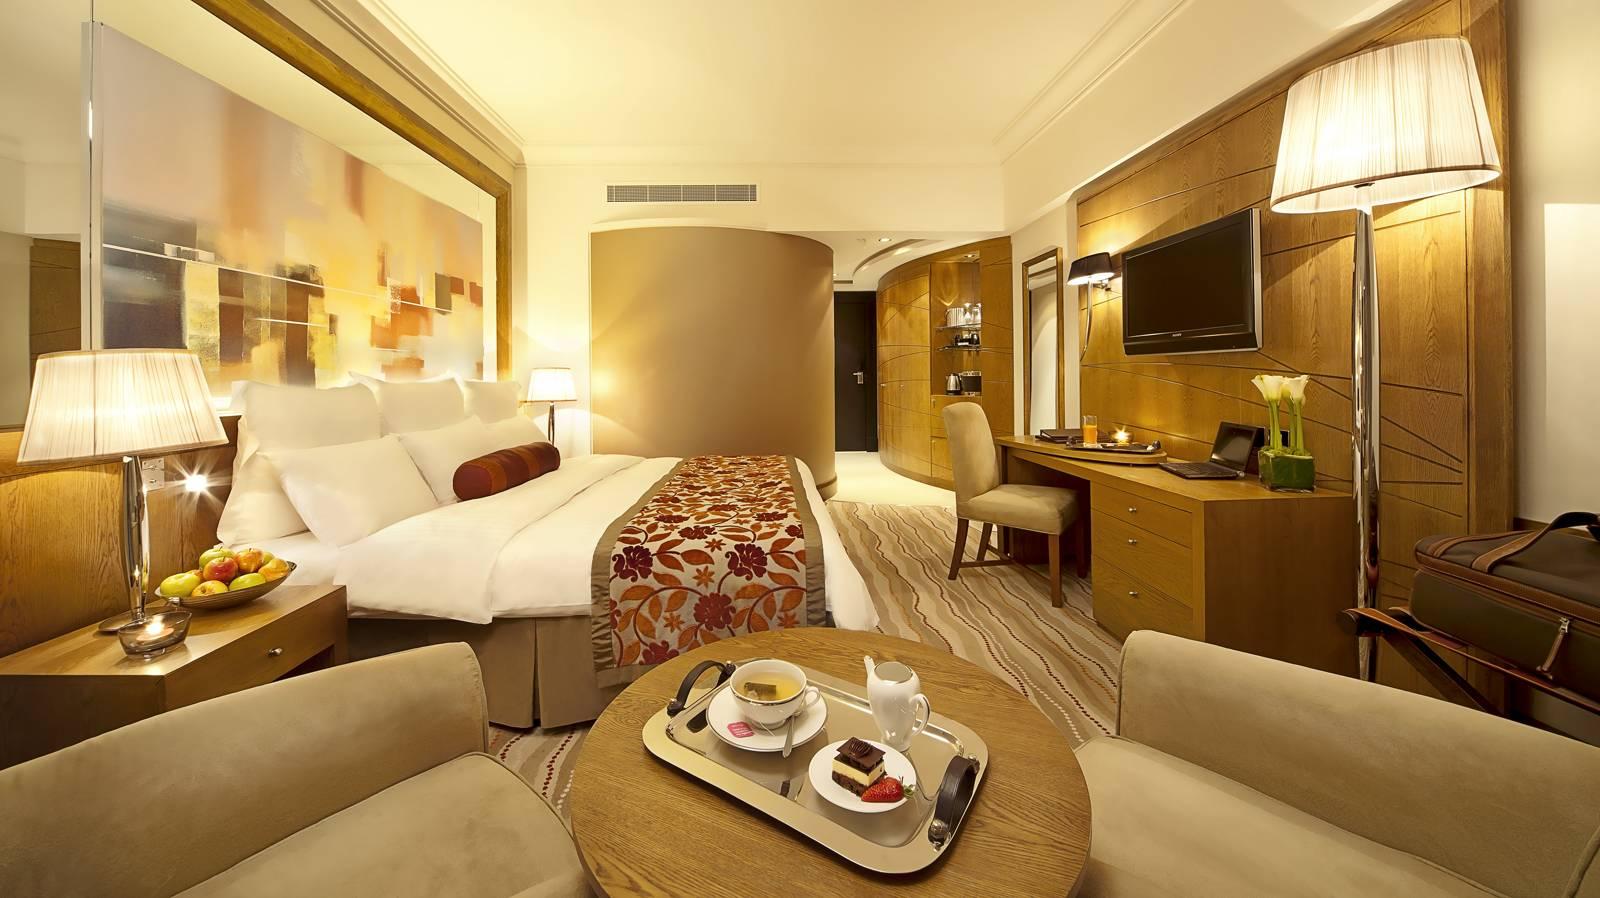 Gulf Hotel Bahrain - Luxury 5 star hotel in Bahrain - Luxury Room.jpg & Image - Gulf Hotel Bahrain - Luxury 5 star hotel in Bahrain - Luxury ...